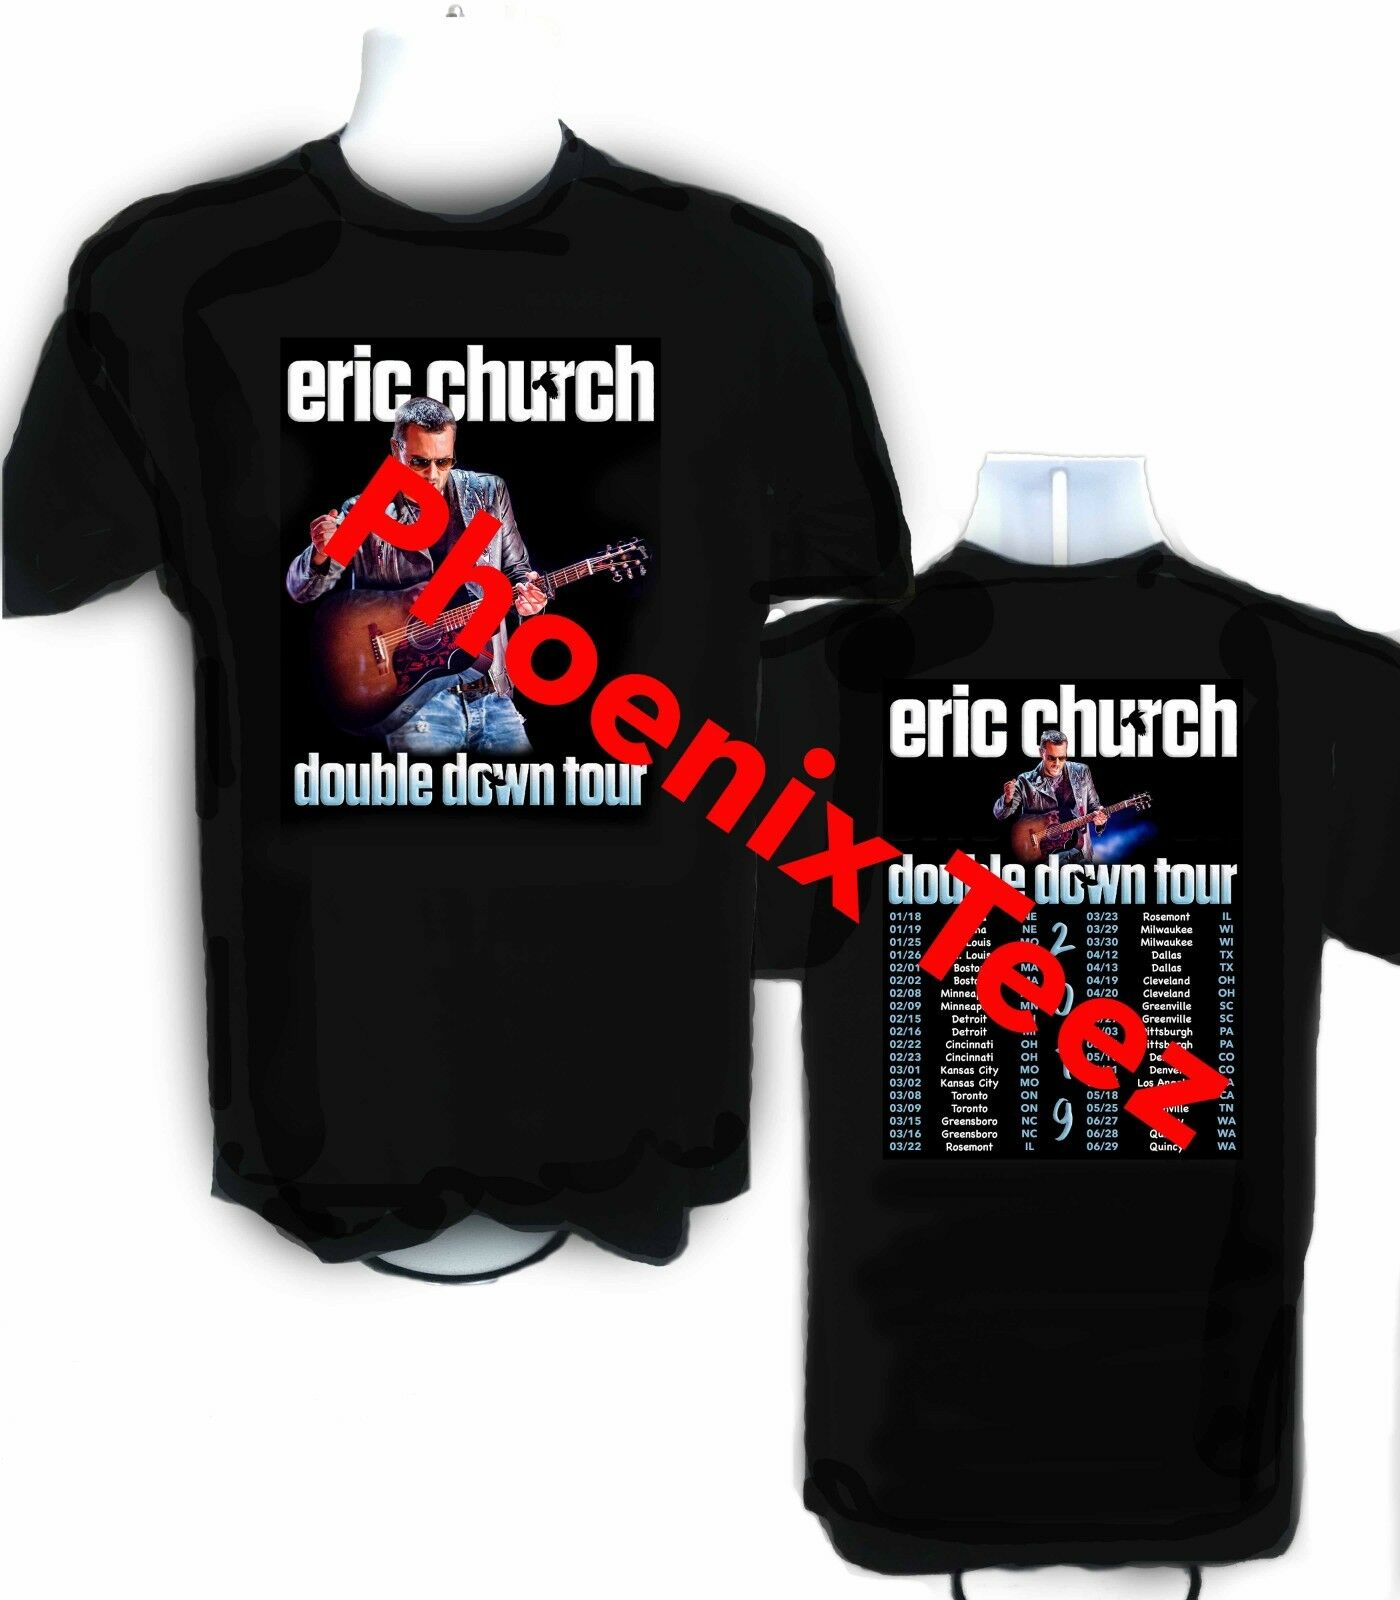 Eric Church 2019 Double Down Tour t shirt  Sizes S - 6X